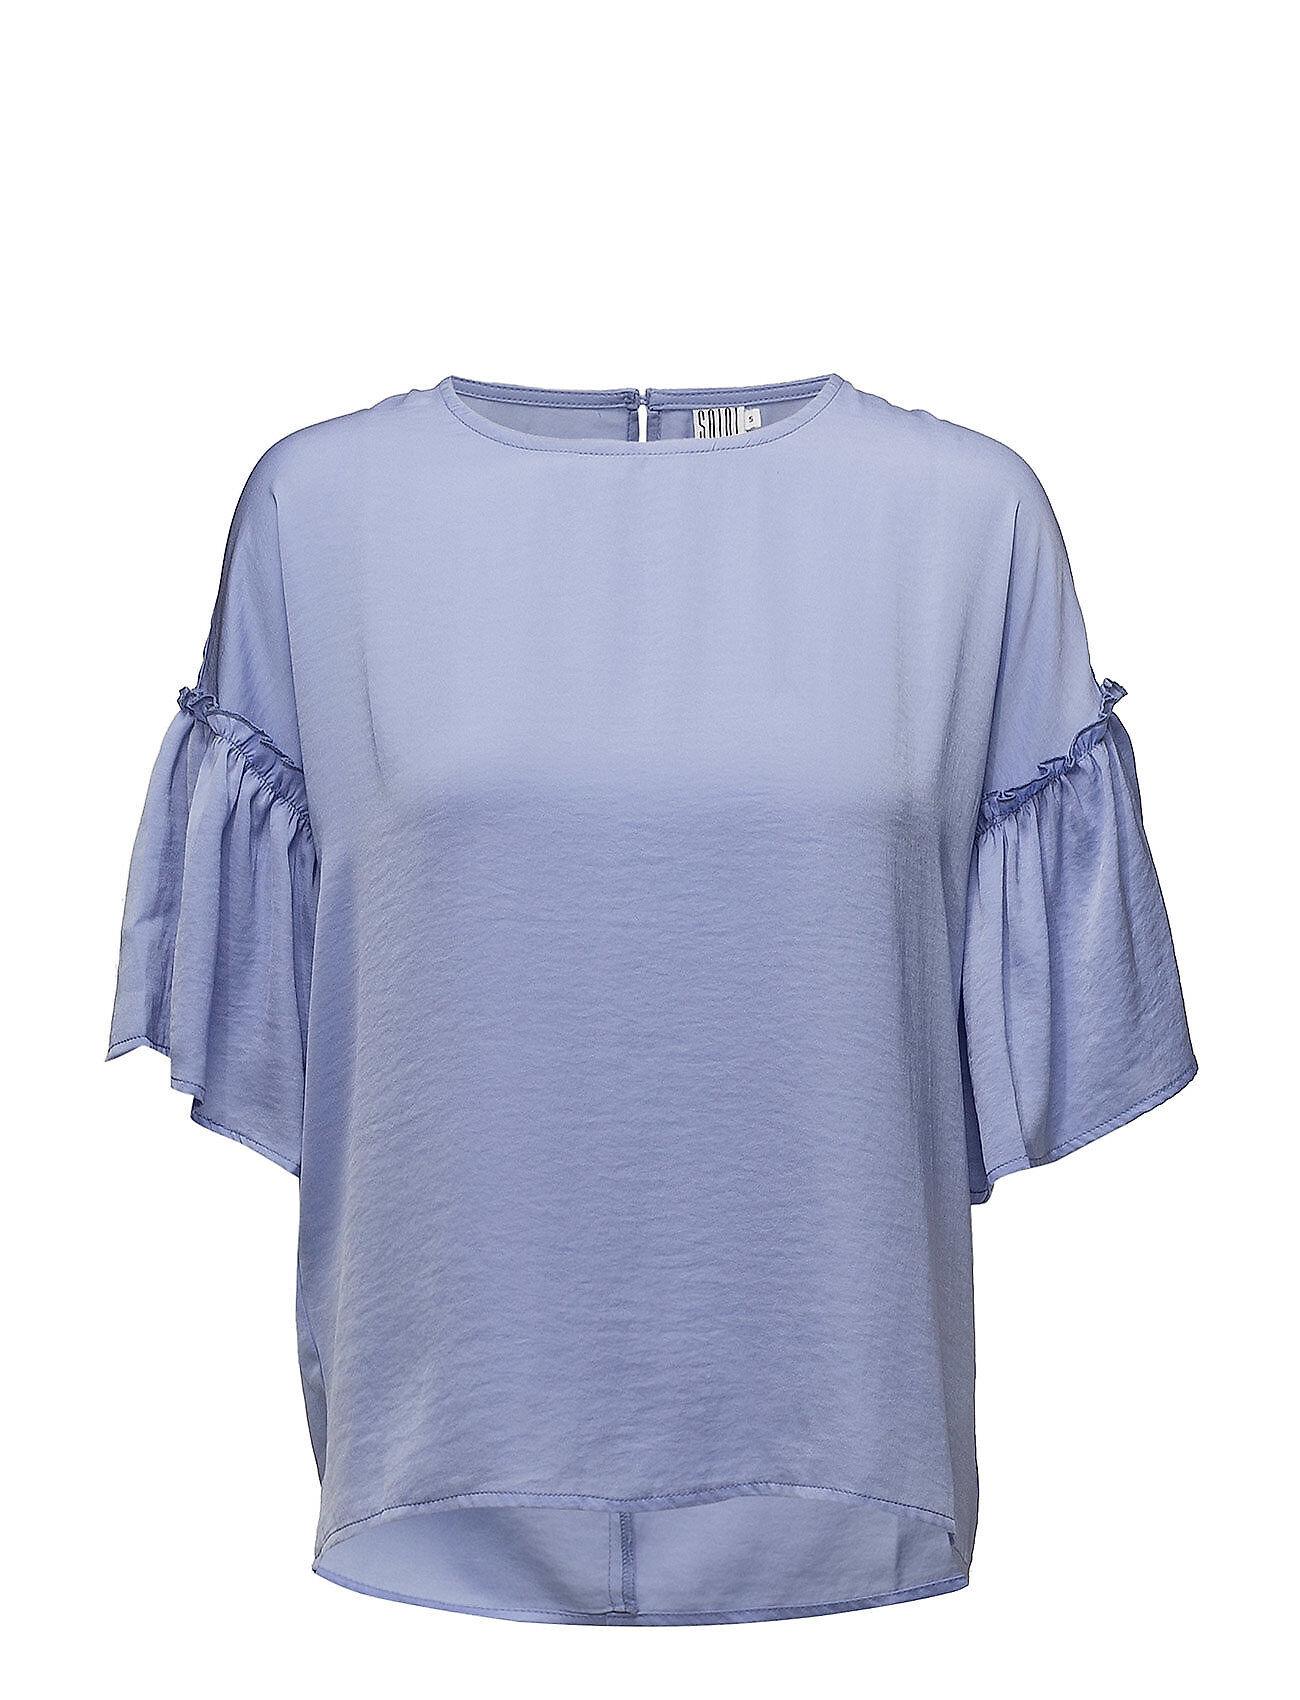 Saint Tropez Blouse With Ruffle Sleeve Blouses Short-sleeved Sininen Saint Tropez